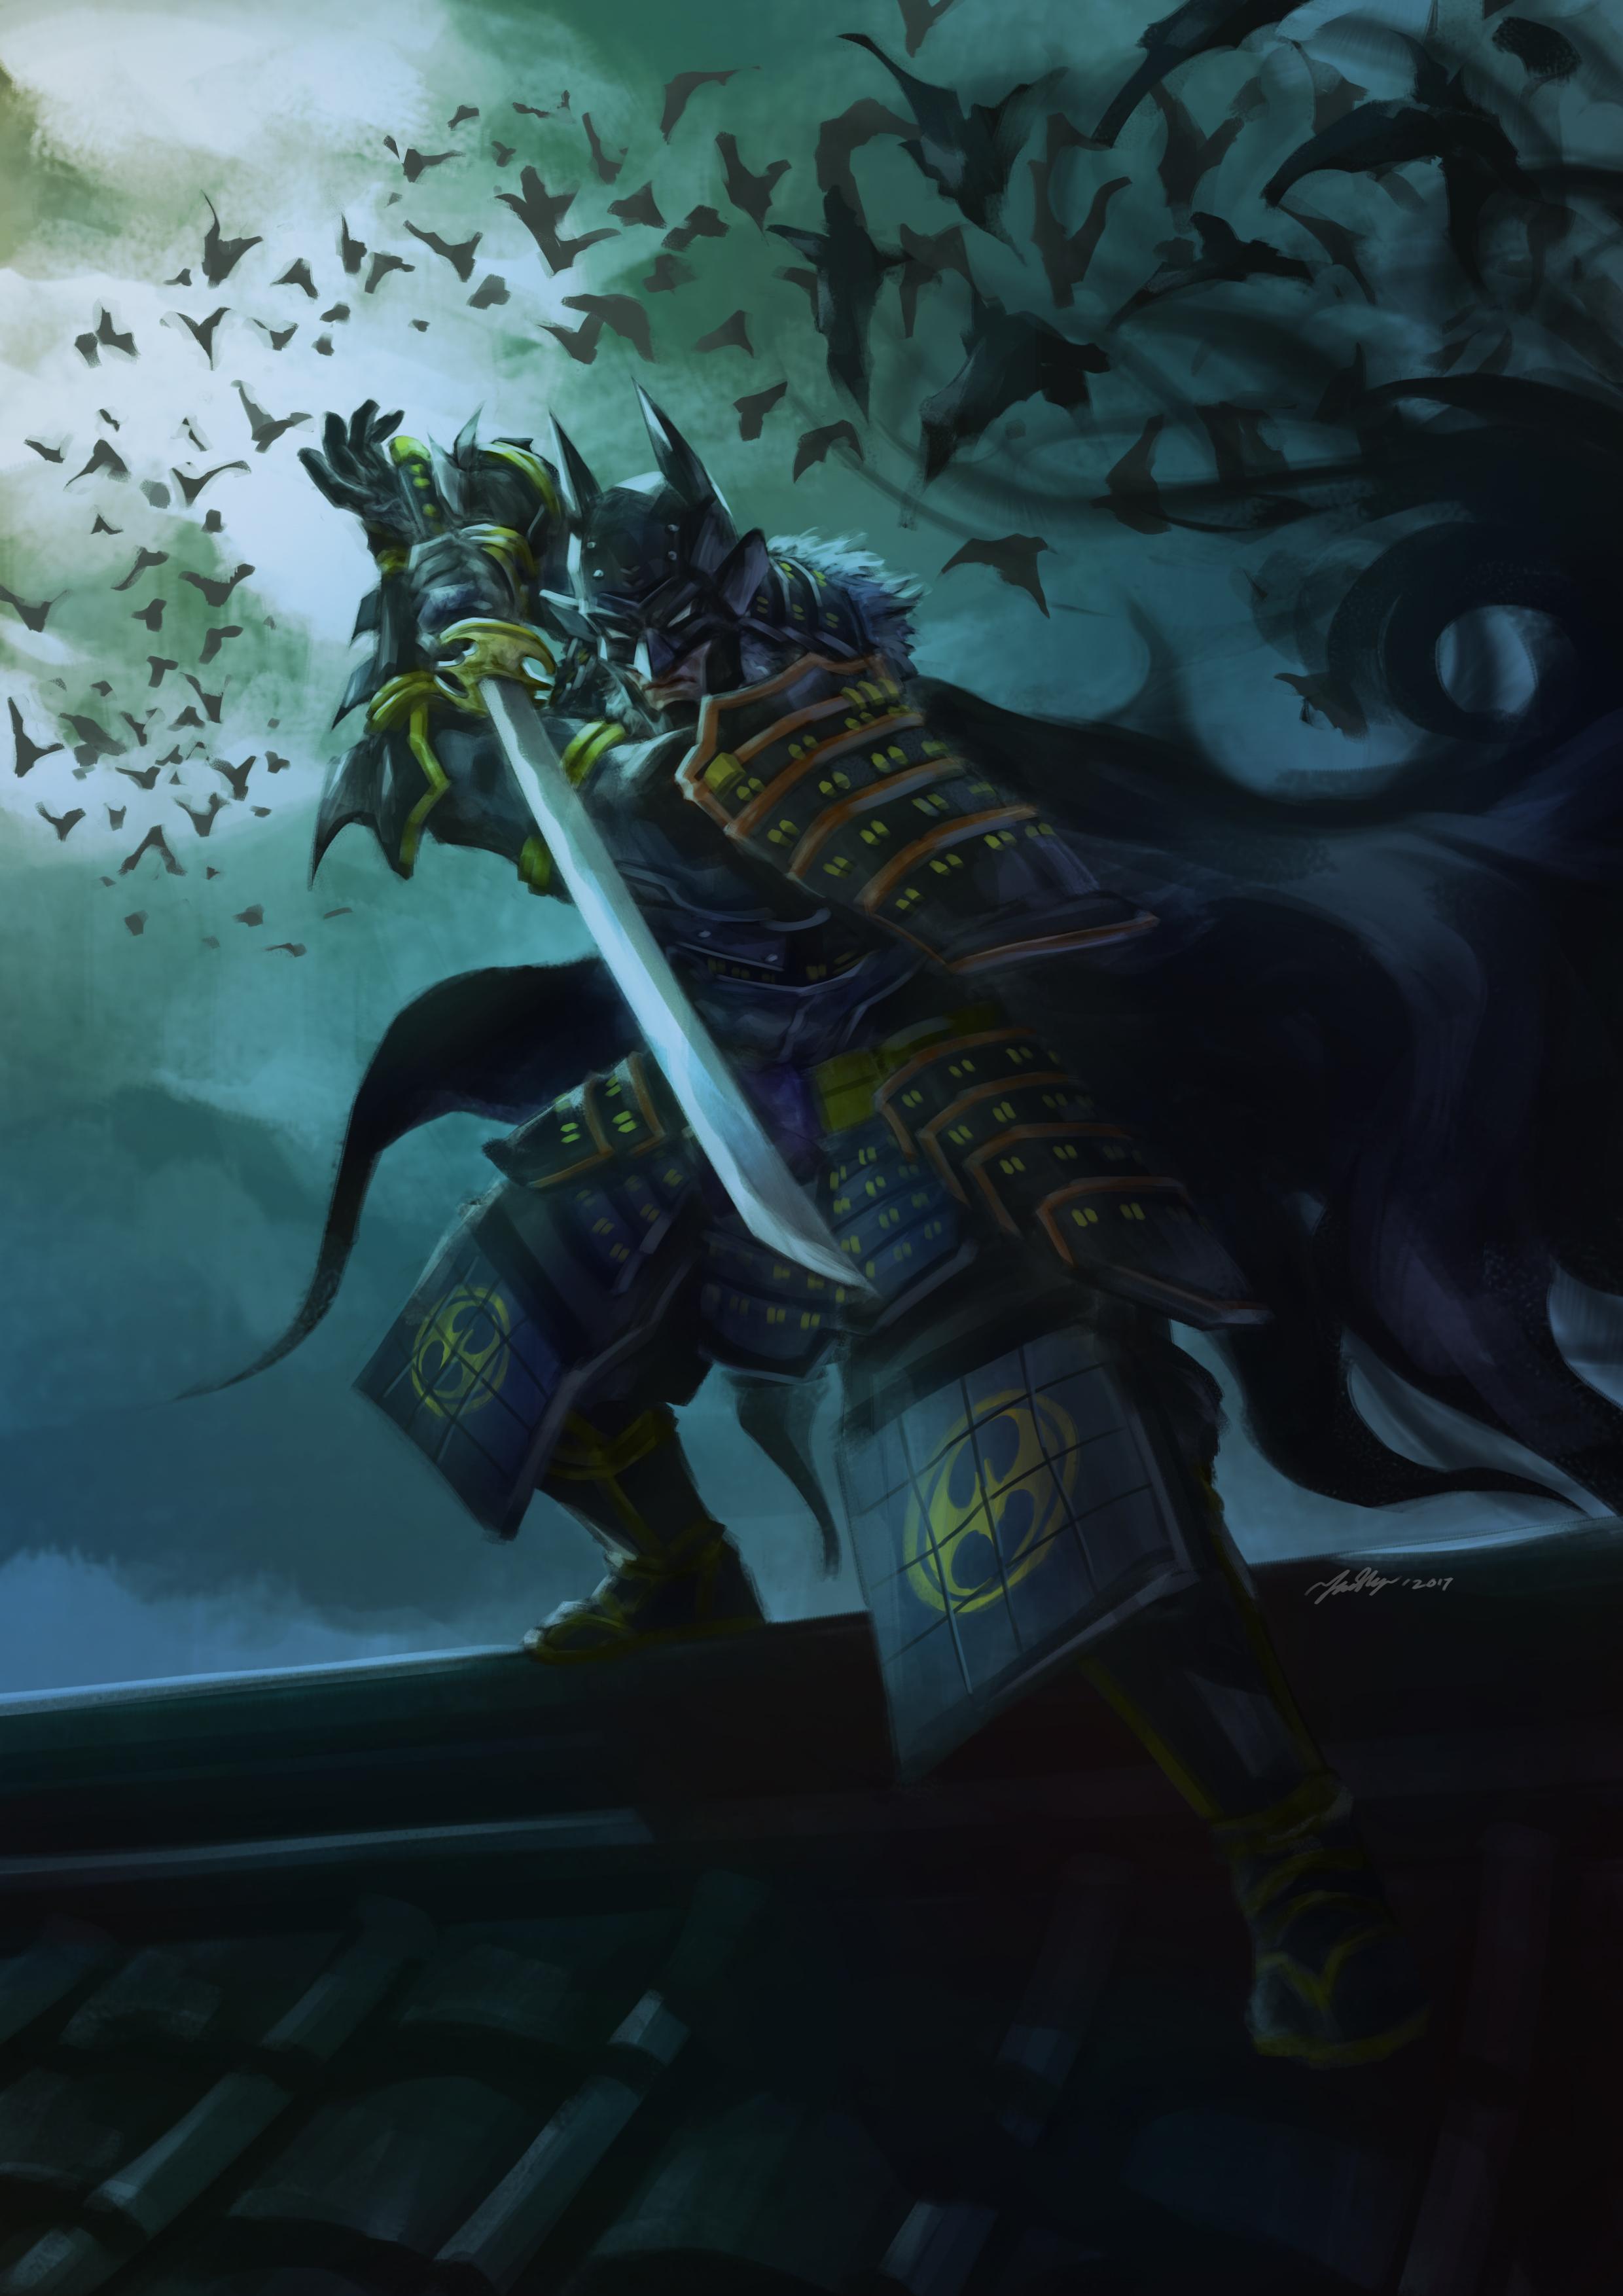 186 Best Batman Ninja Images On Pholder Batman D Ccomics And Injustice Mobile